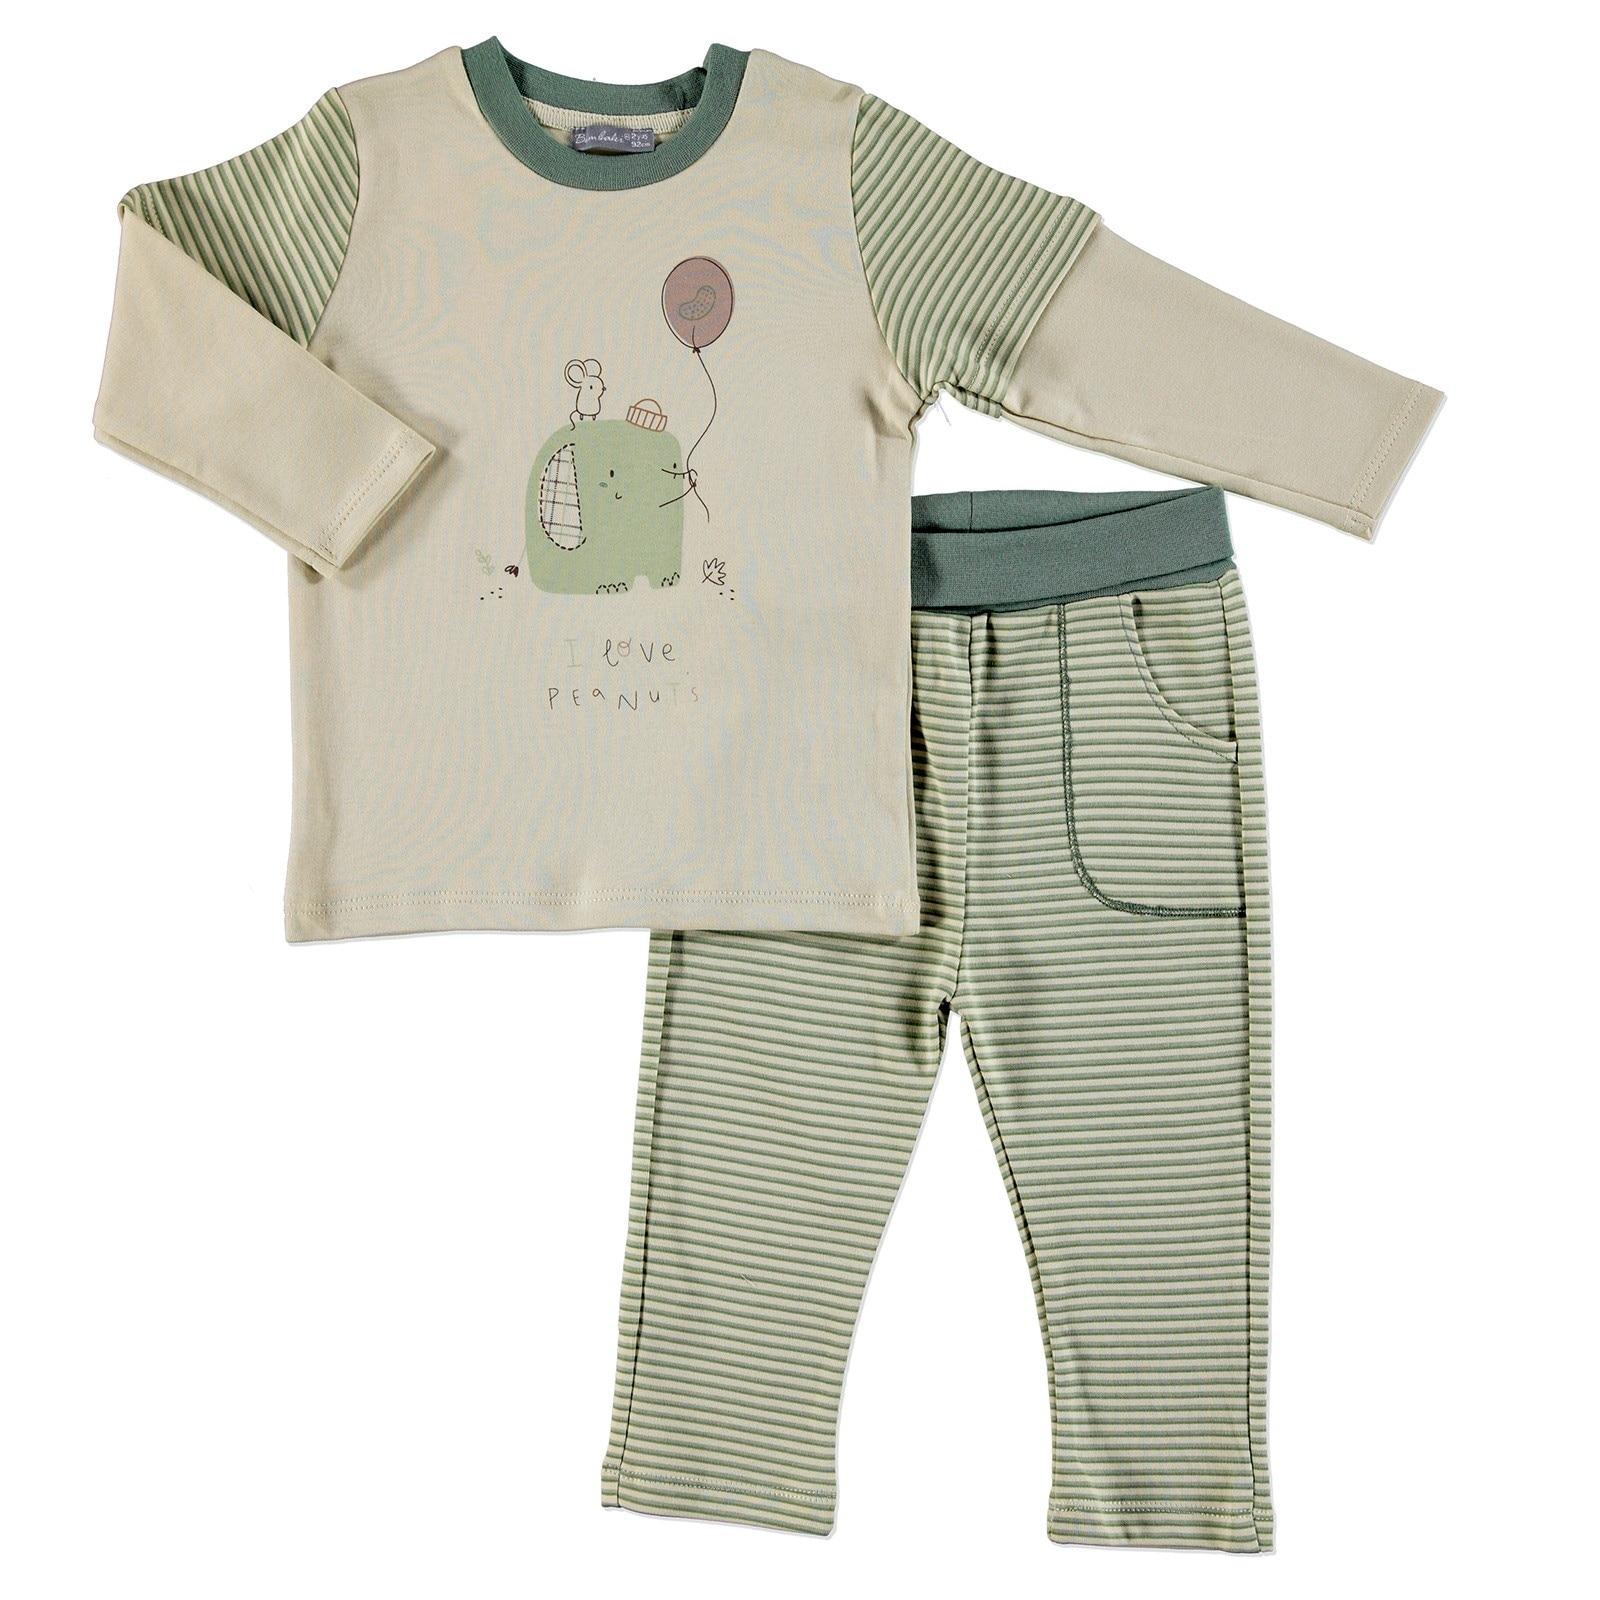 Ebebek Bambaki Cold Days Baby Boy Sweatshirt Tousers Set